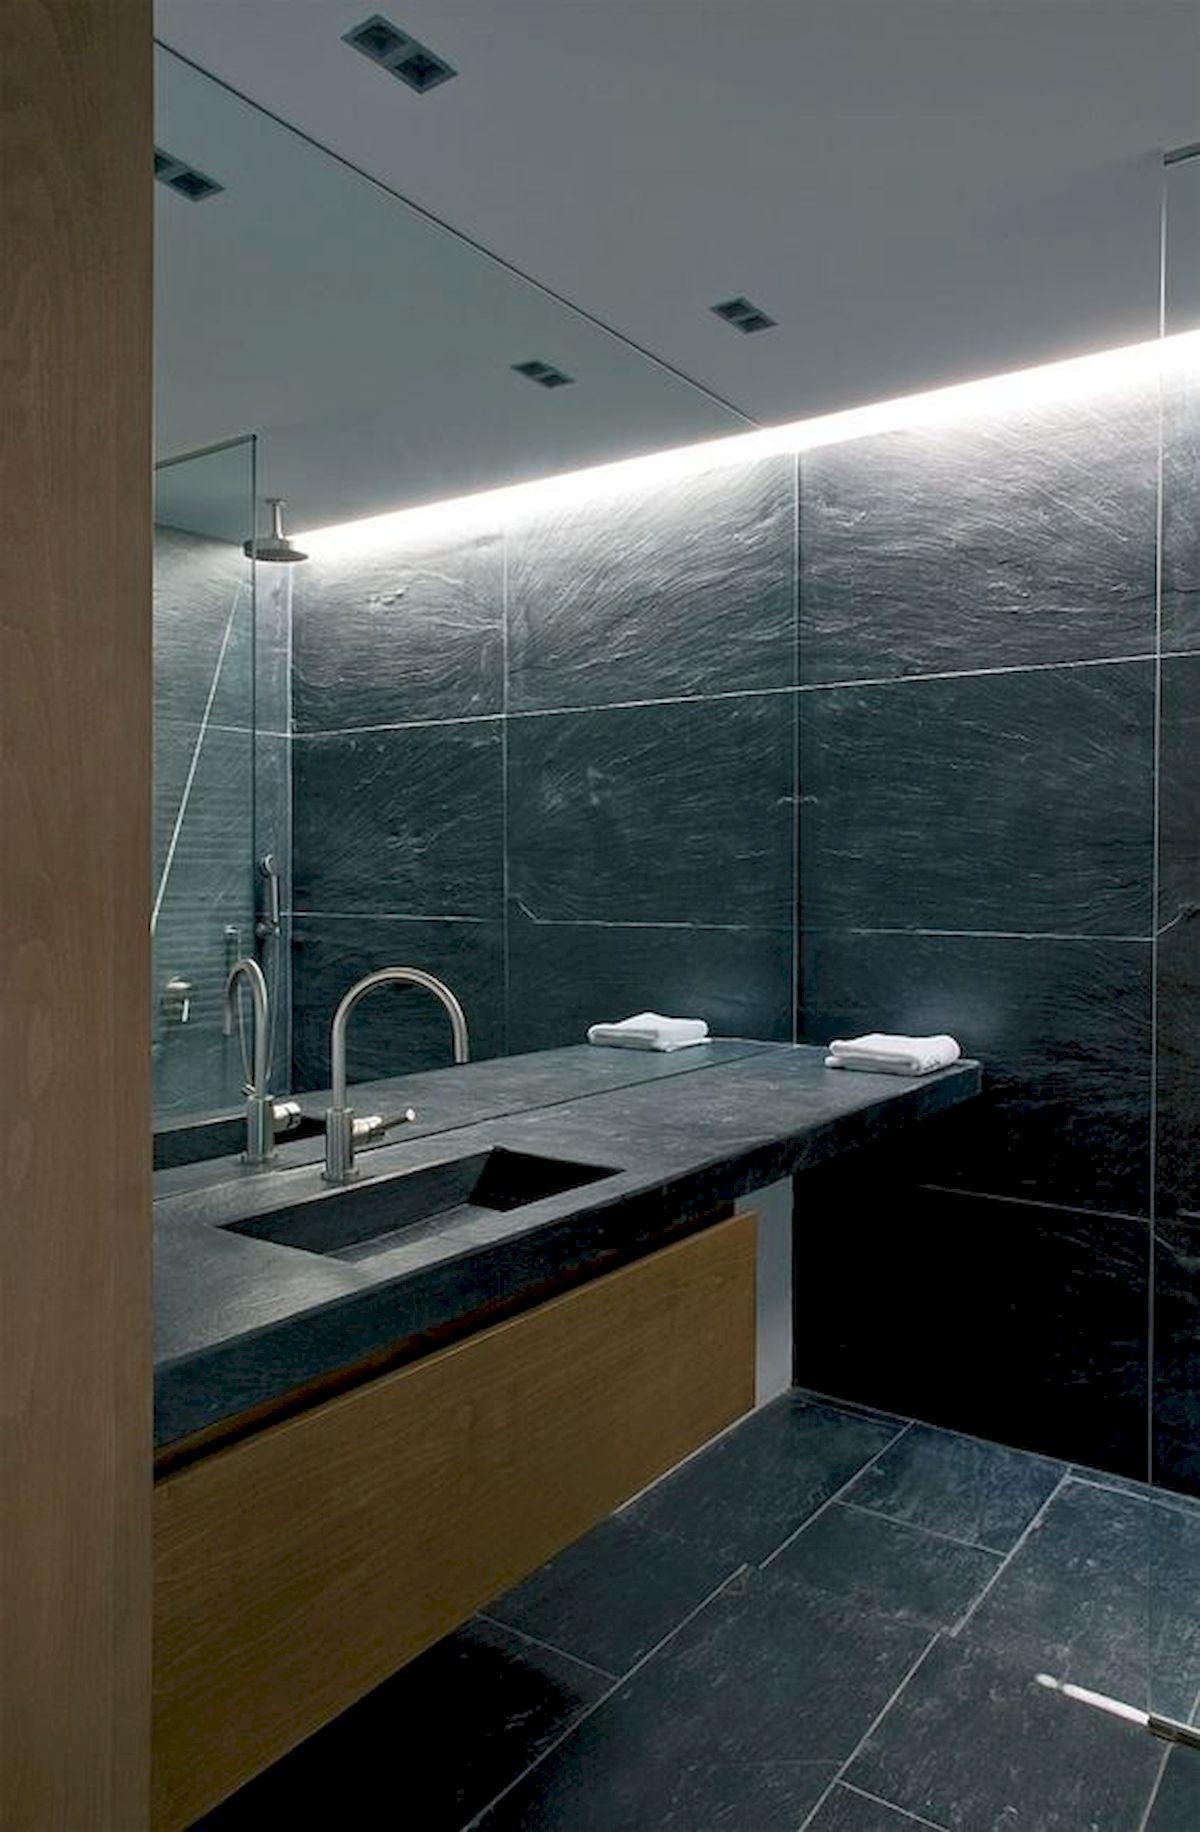 26 Easy and Creative DIY Mirror Ideas To Decorate Your Bathroom (13)